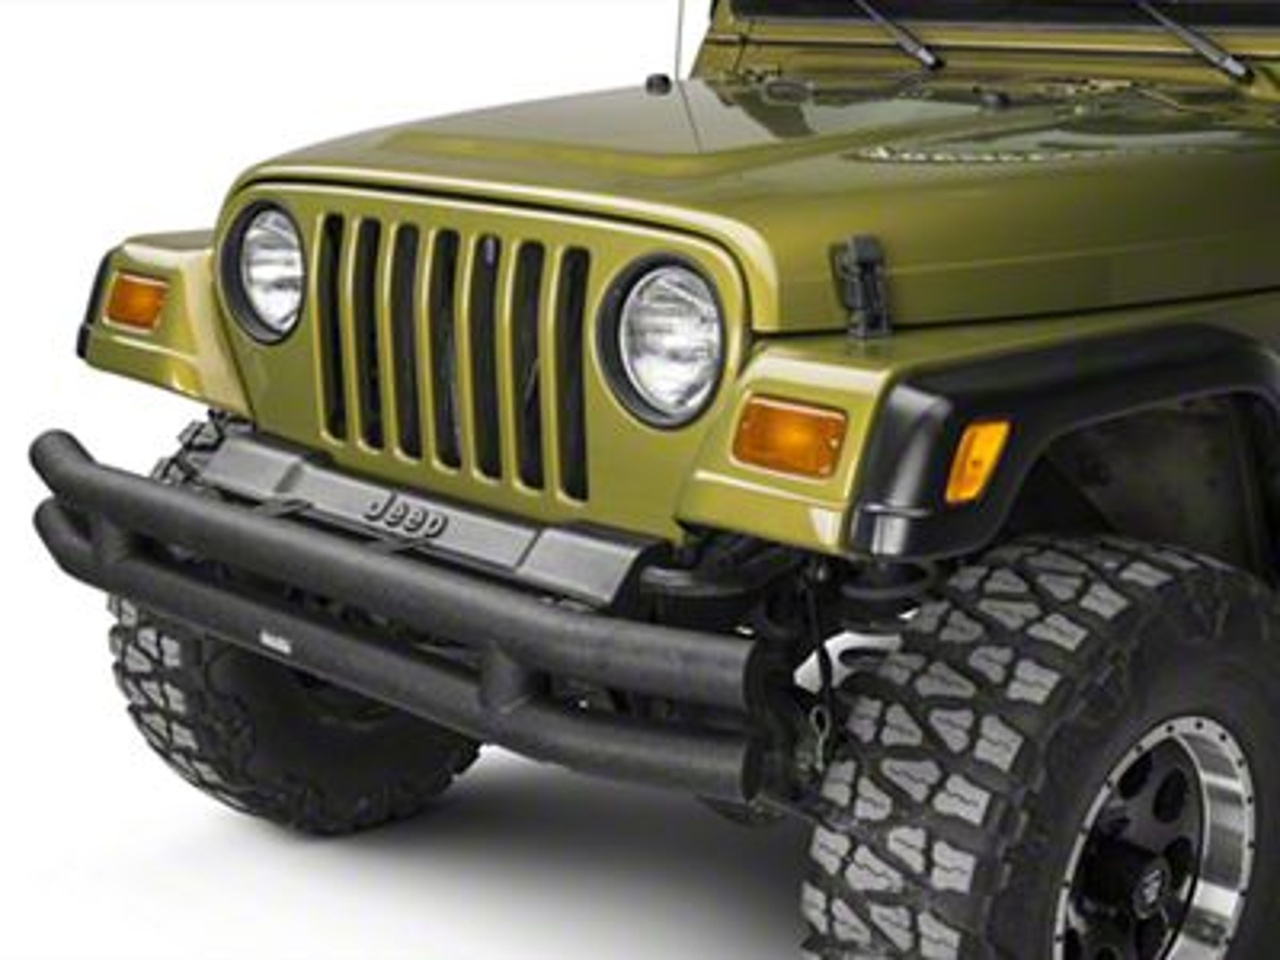 Rugged Ridge Tubular Front Bumper - Textured Black (87-06 Jeep Wrangler YJ & TJ)